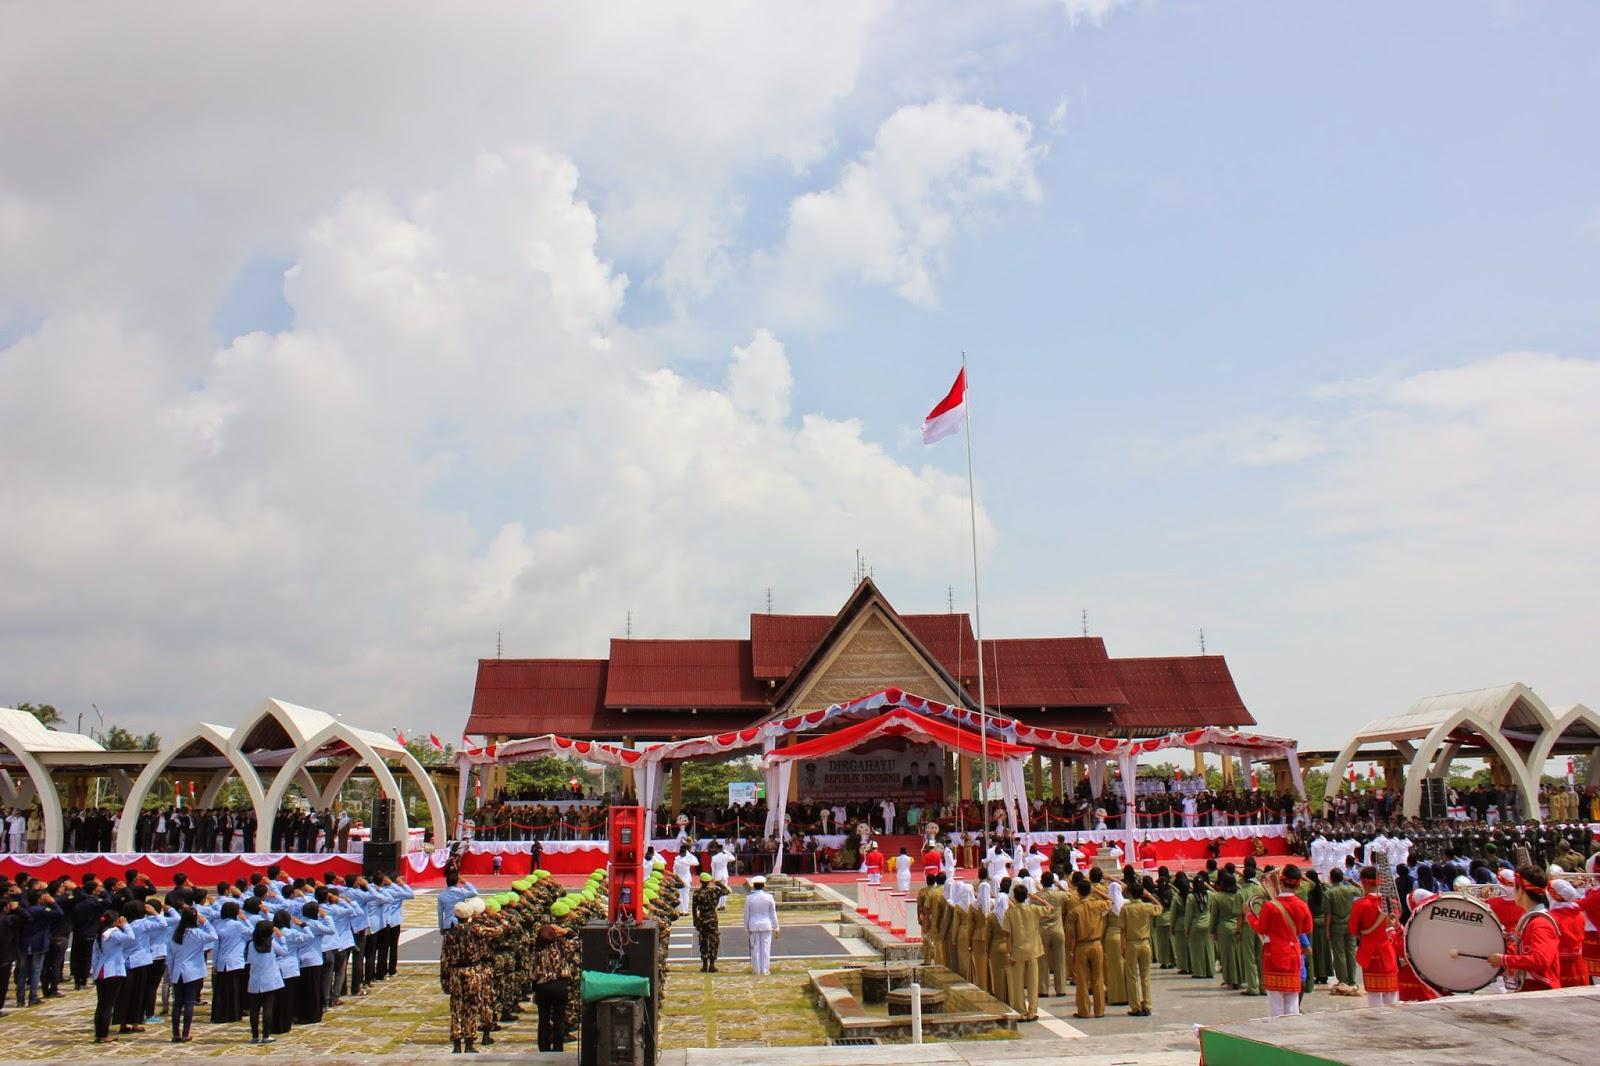 Foto Upacara Bendera 17 Agustus